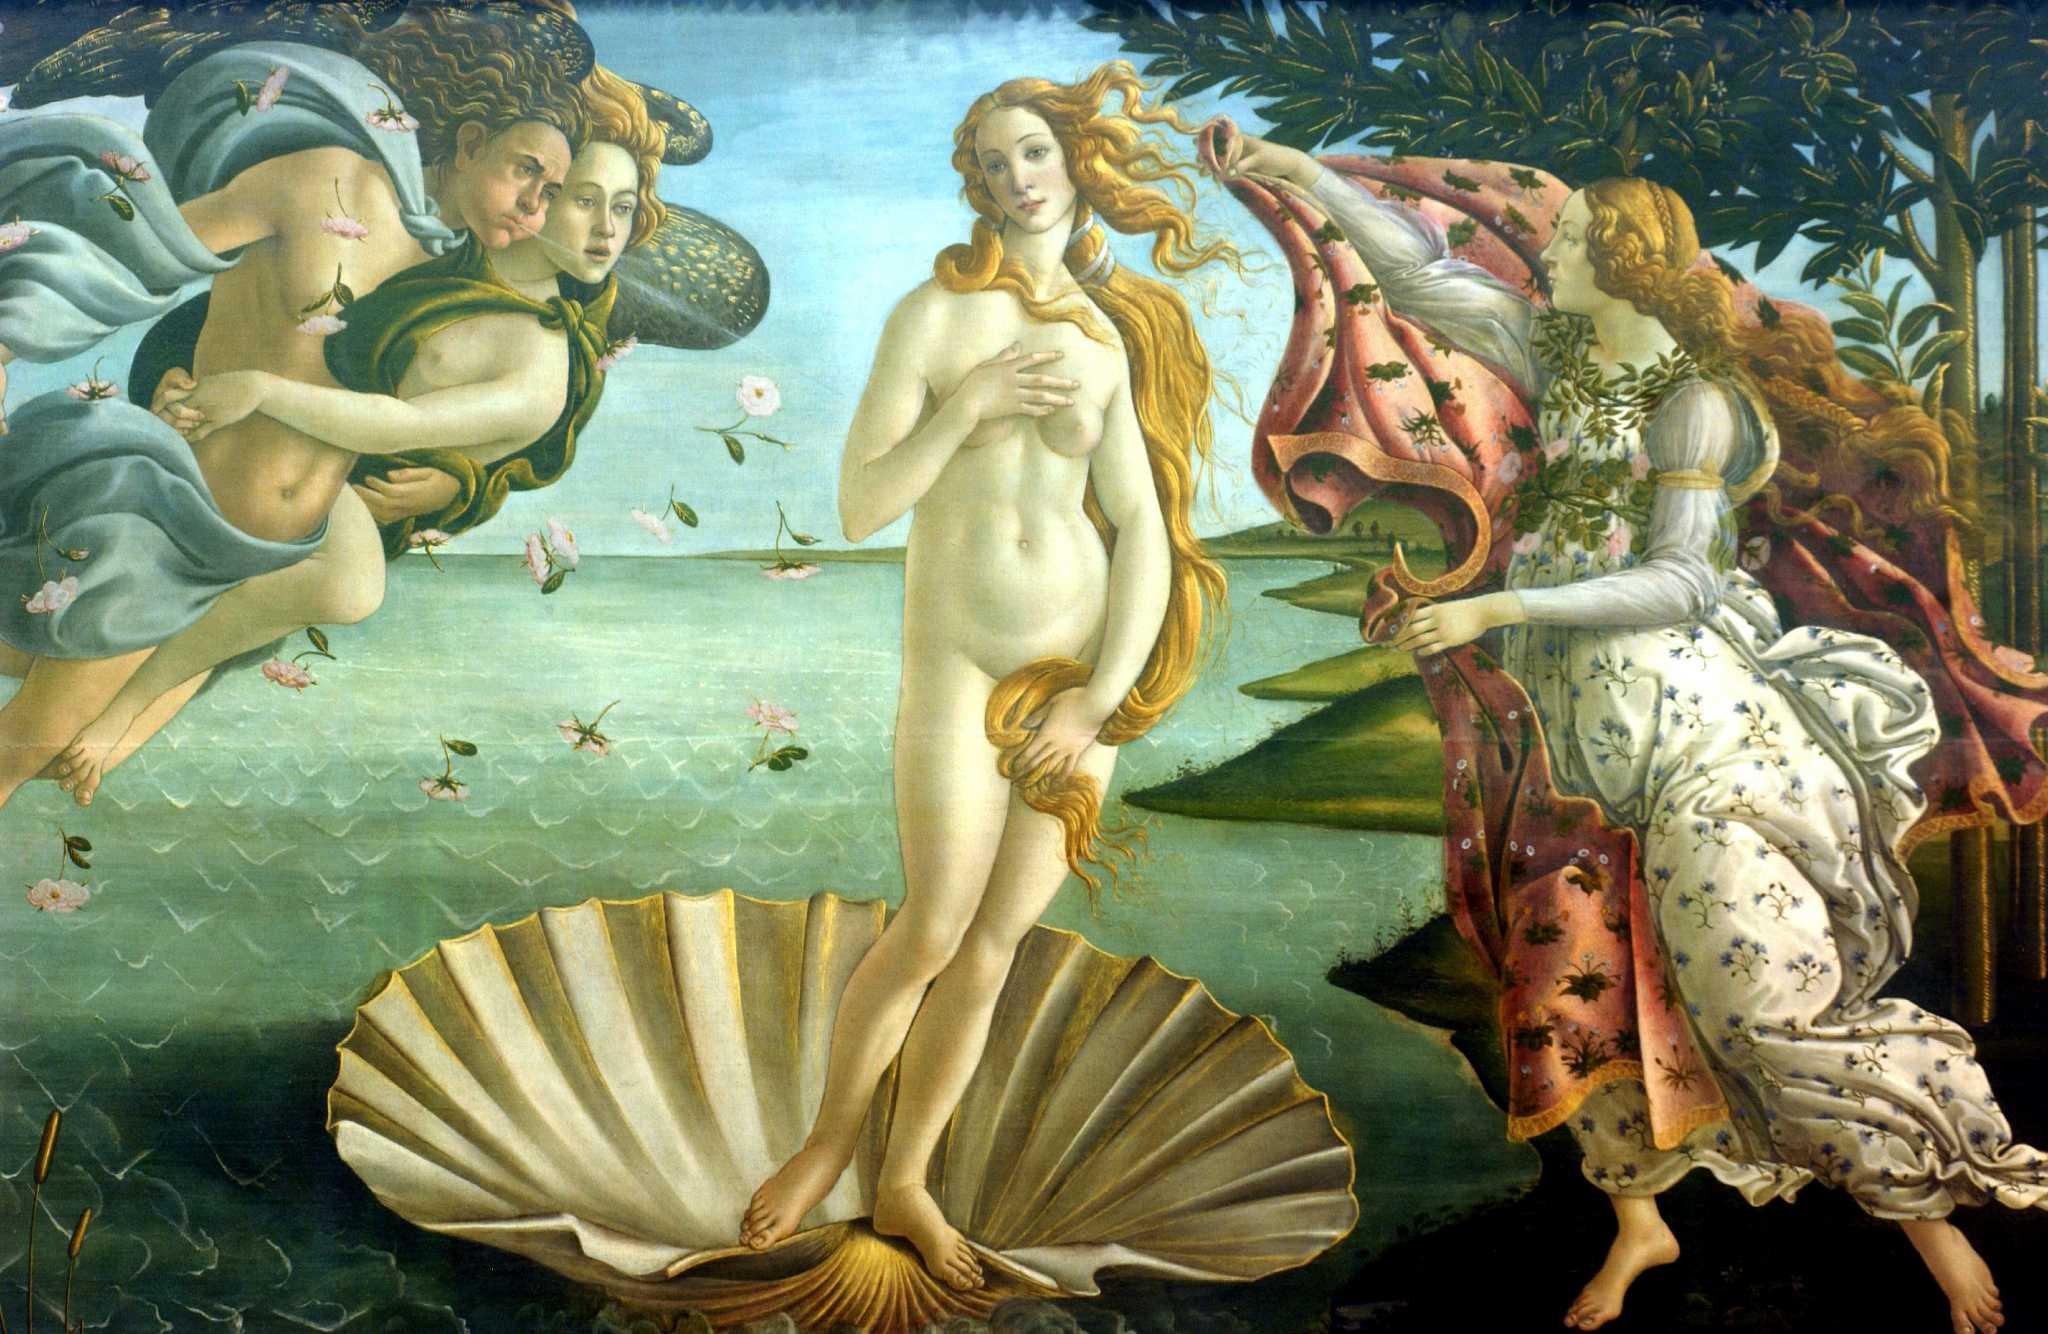 San Antonio Express News >> Time to study 'The Birth of Venus' - San Antonio Express-News